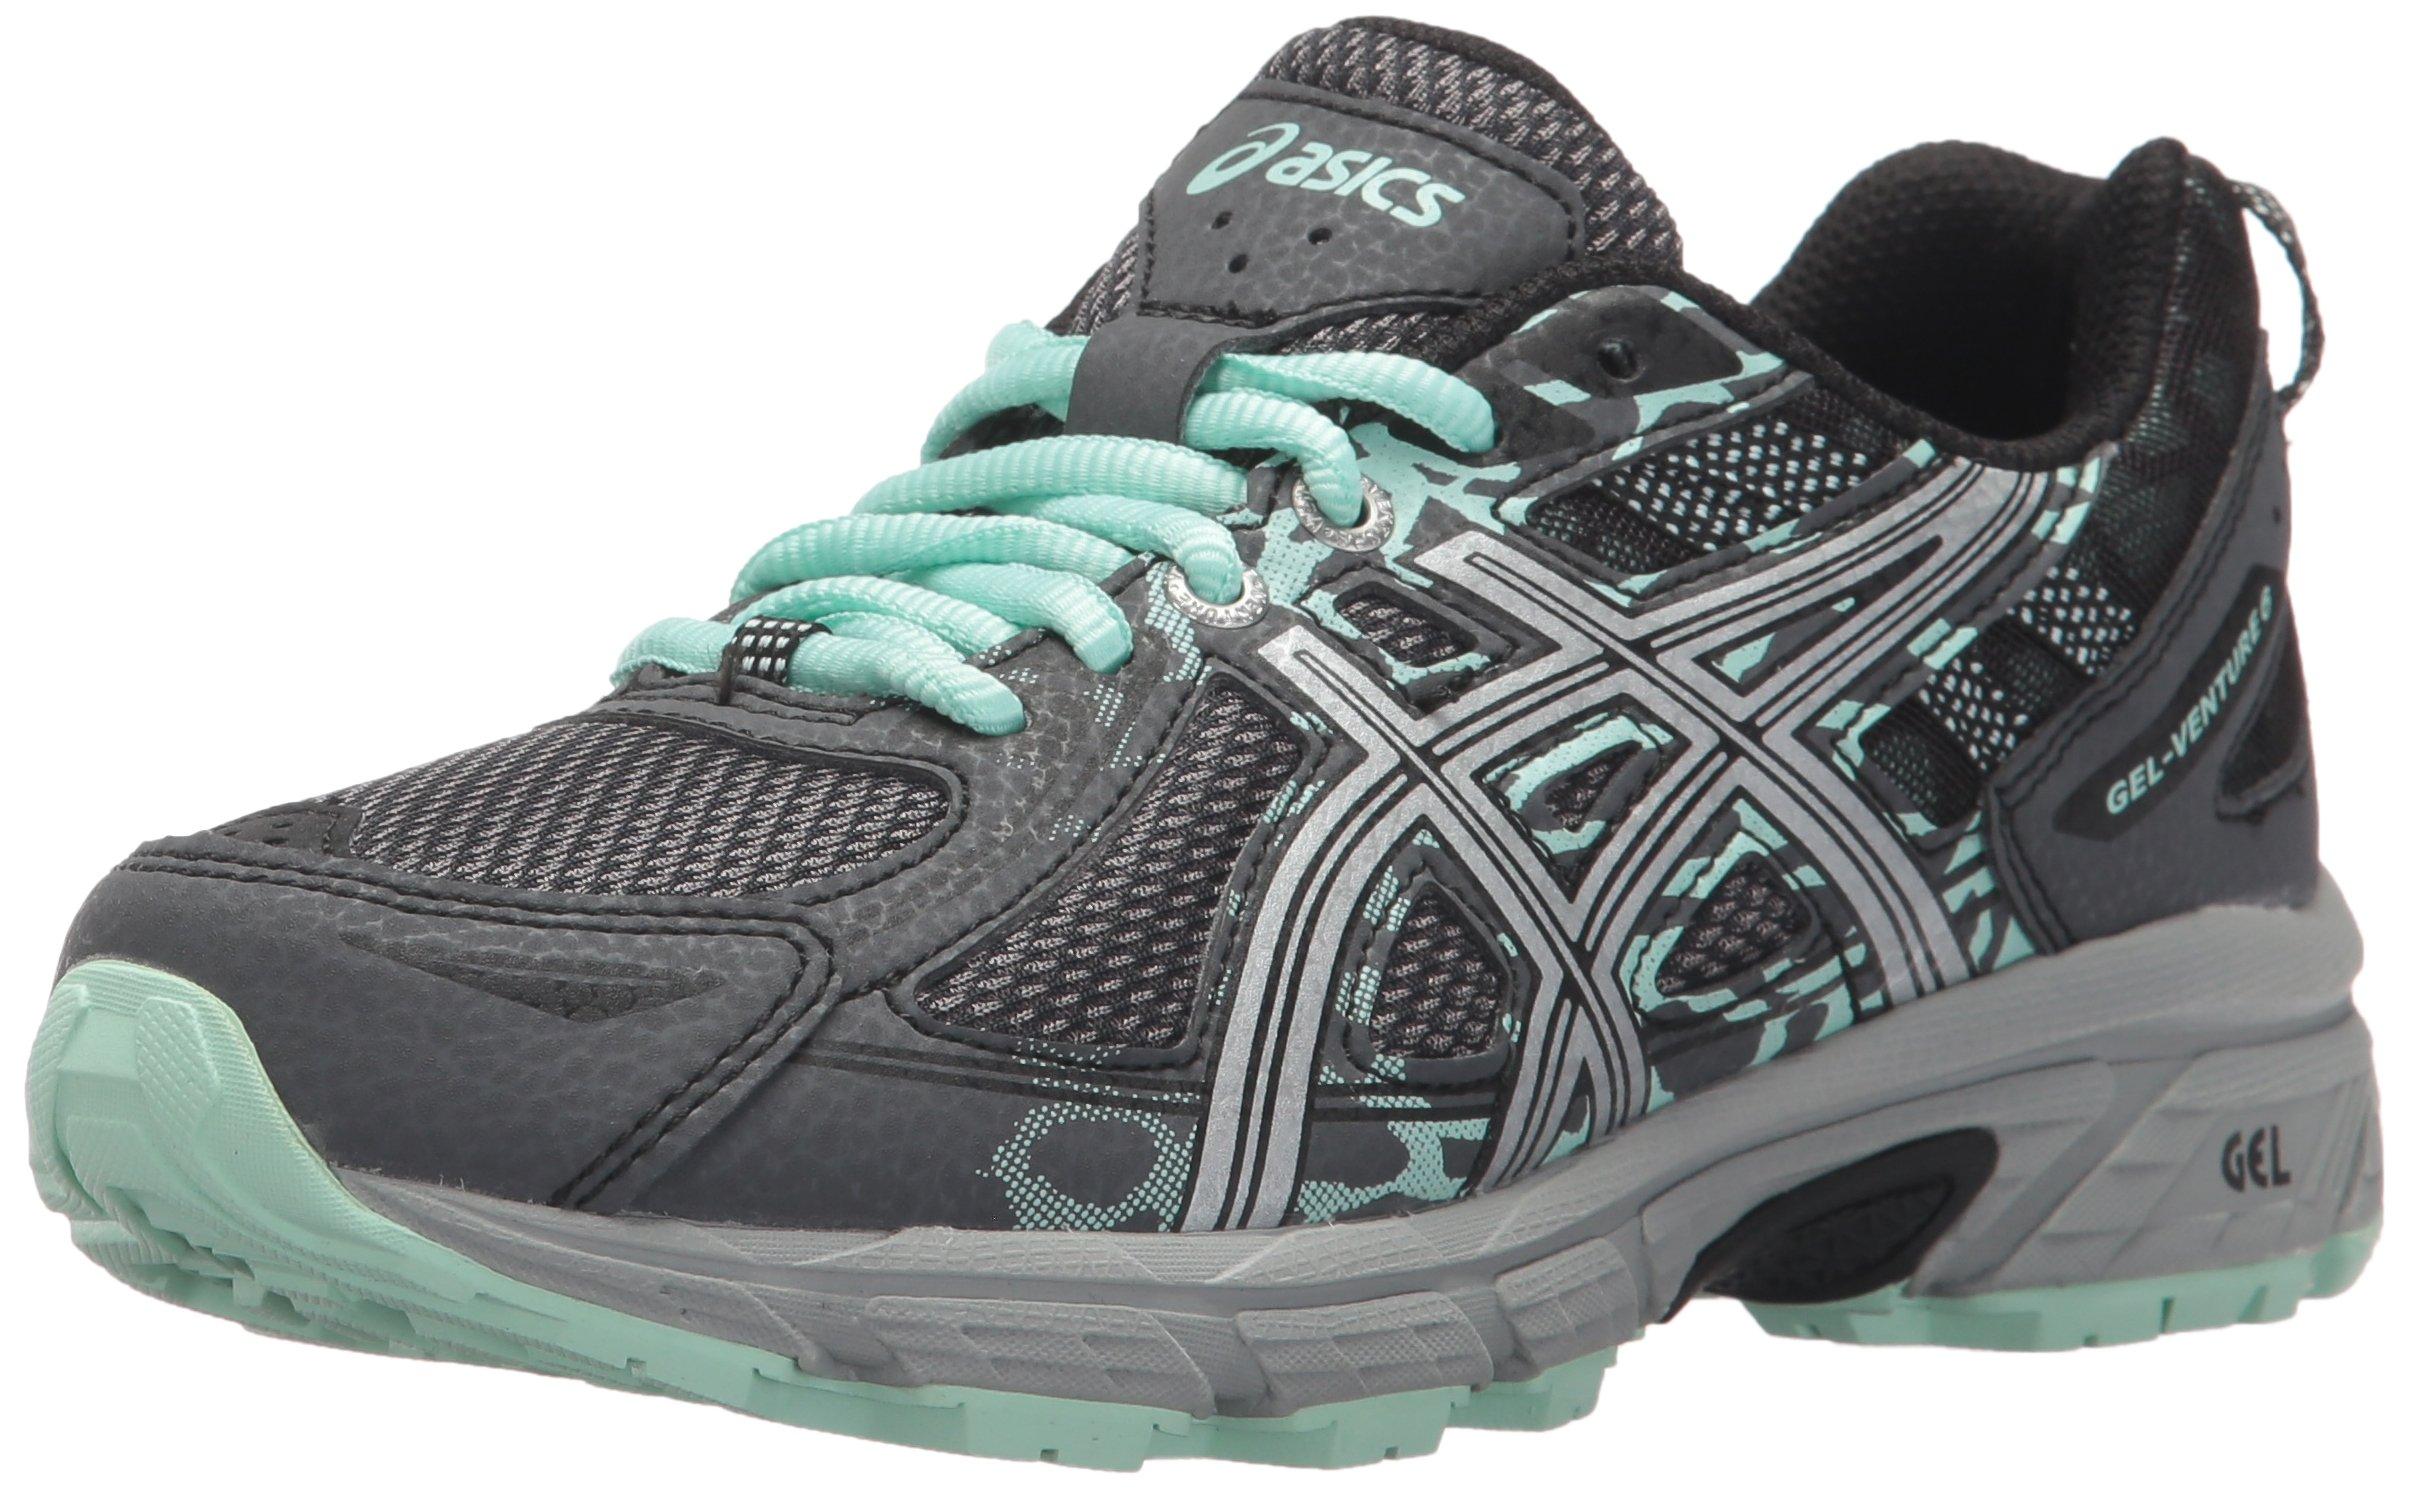 ASICS Women's Gel-Venture 6 Running-Shoes,Castlerock/Silver/Honeydew,6.5 Medium US by ASICS